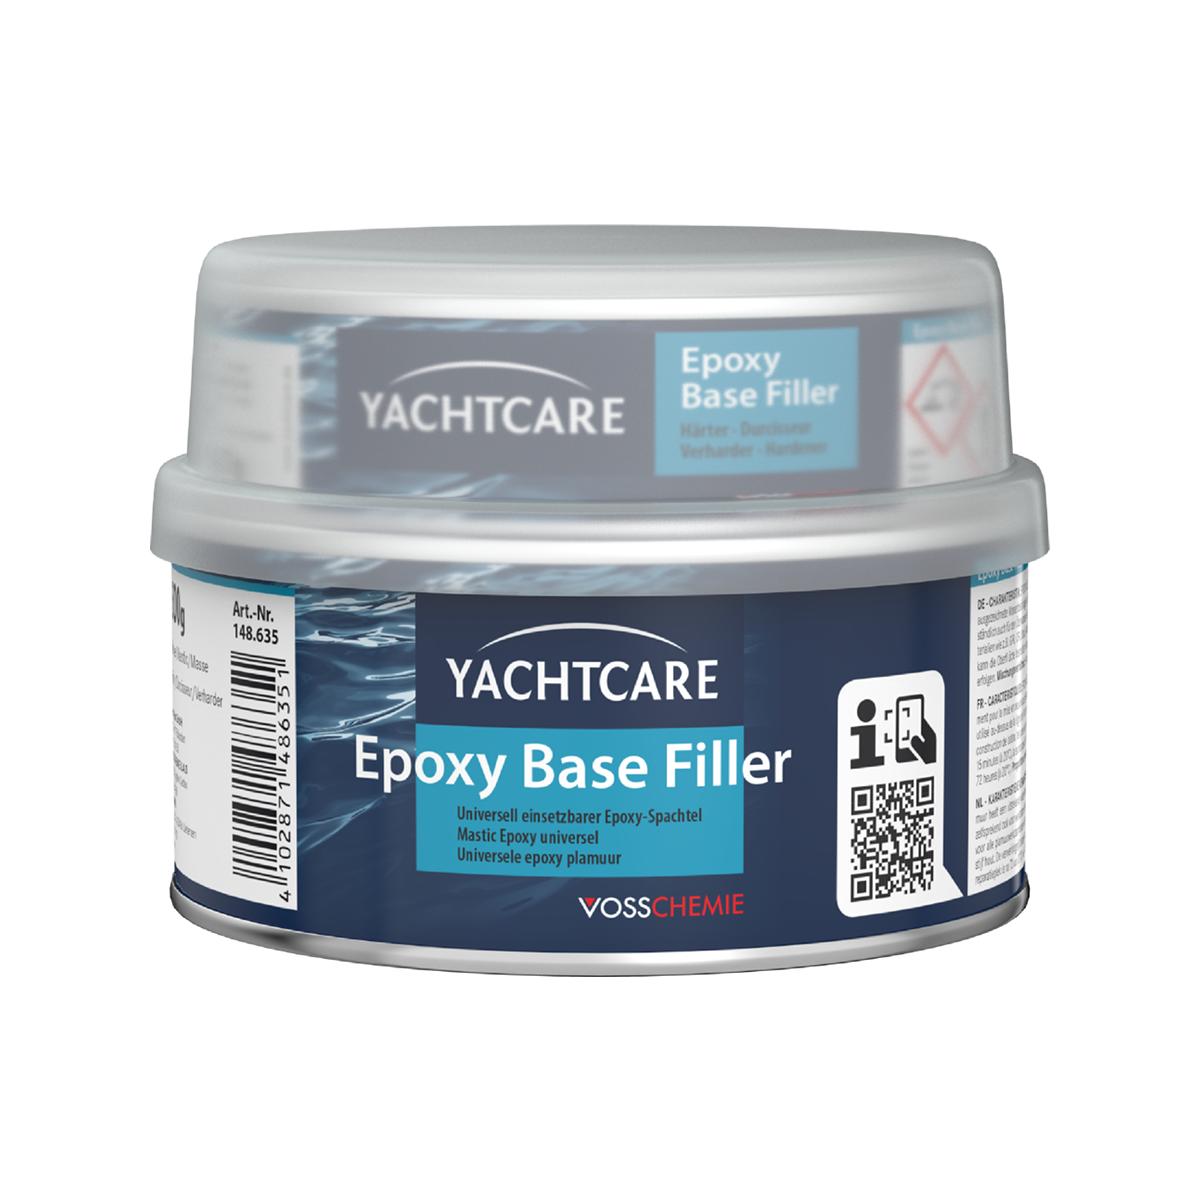 Yachtcare Epoxy Base Filler plamuur lichtgrijs - 2000g